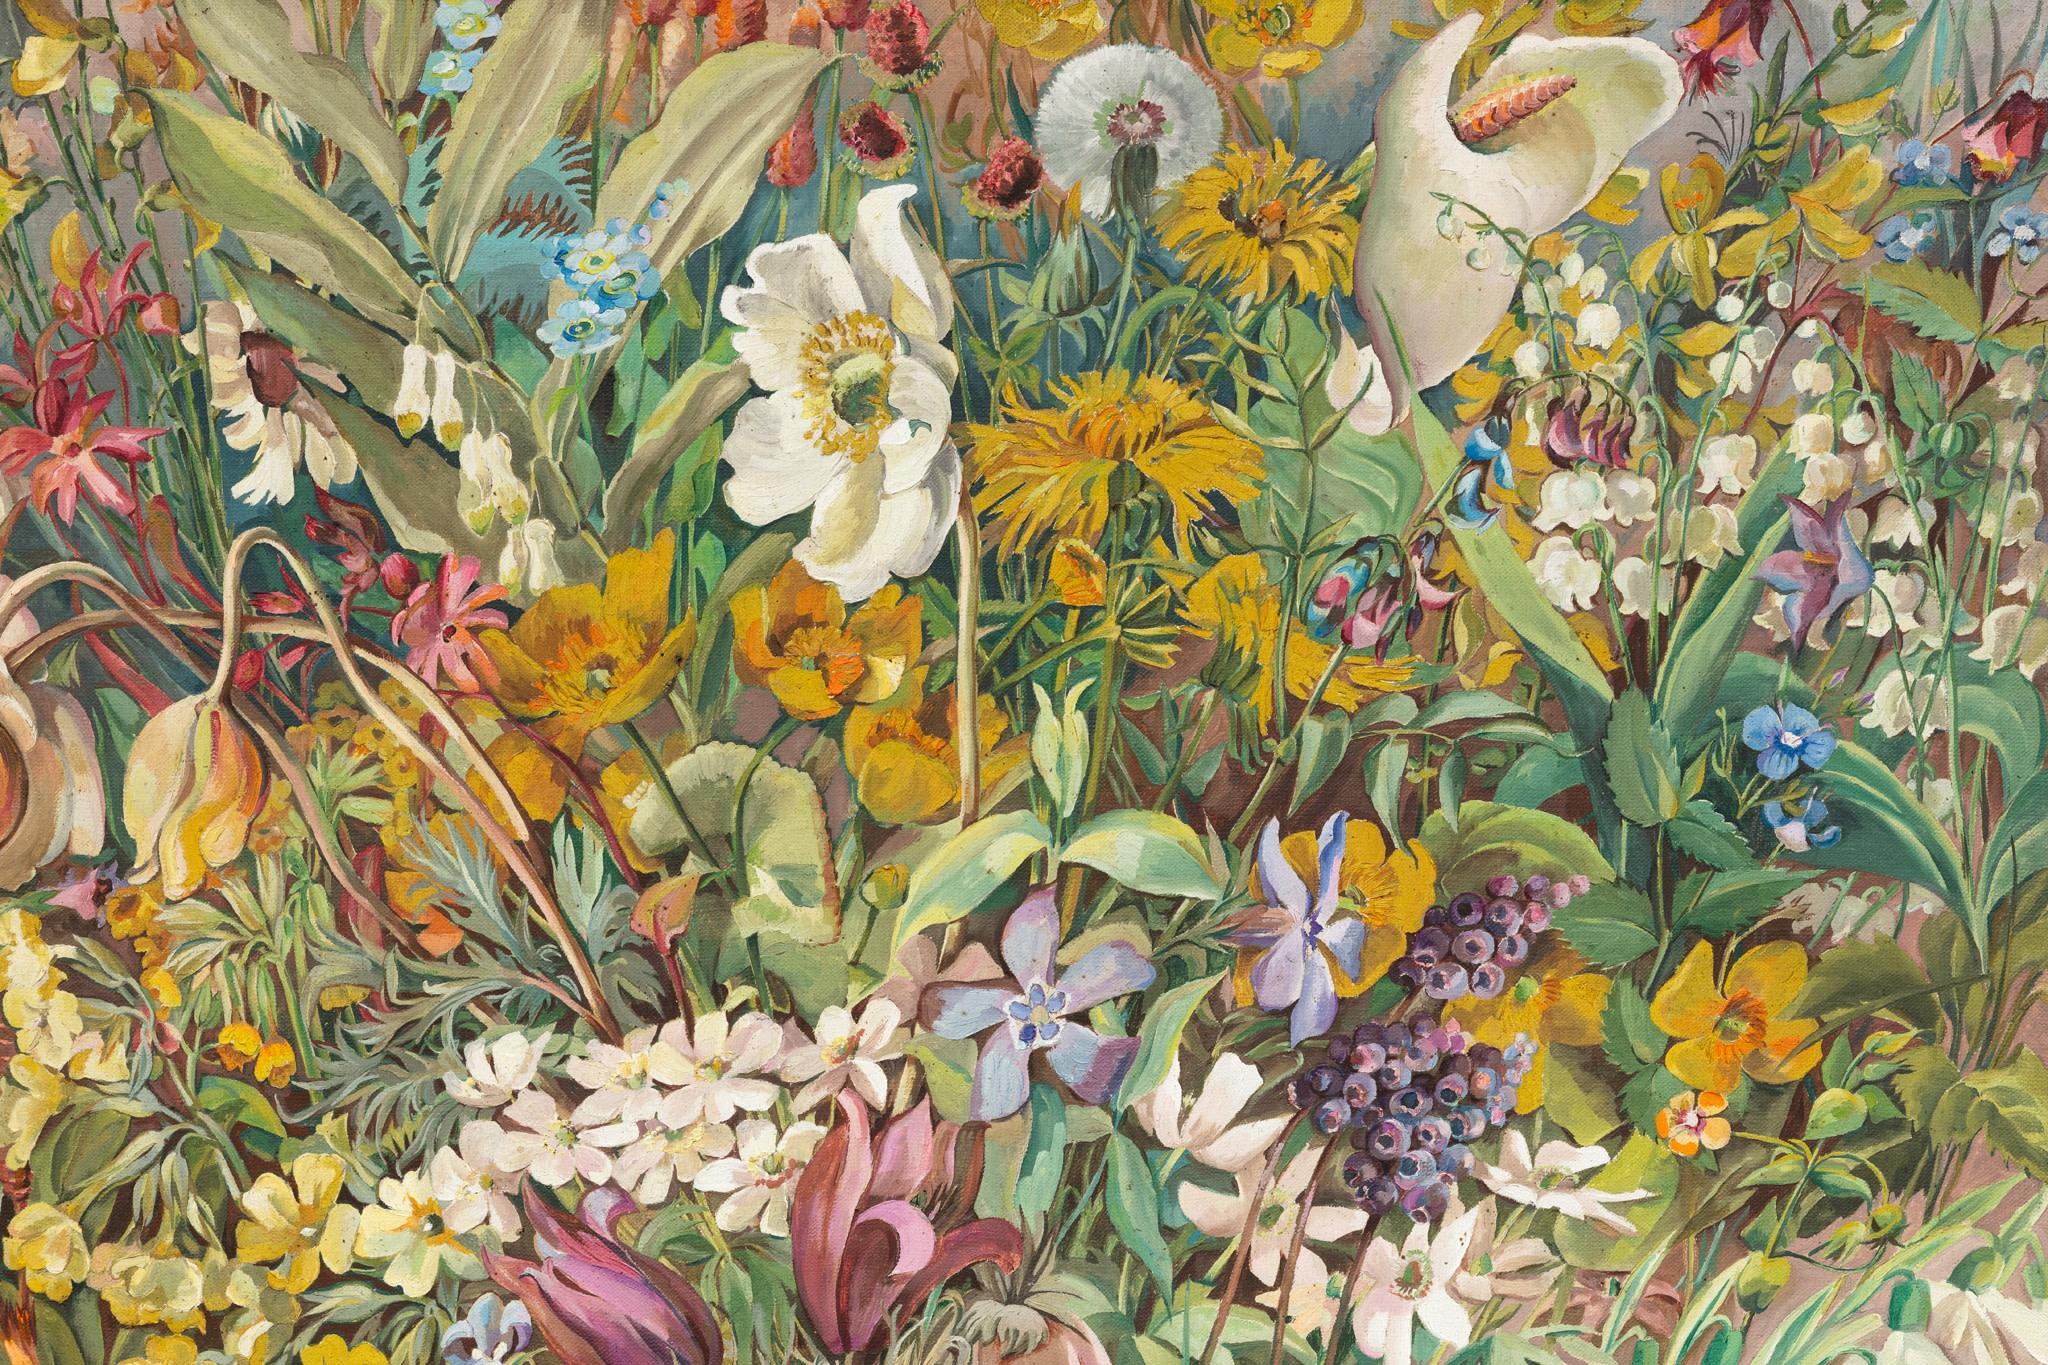 Detail: Hannah Höch, Aus dem blühenden Tal, 1937, oil on canvas, 75,5 x 70,5 cm (29 3/4 x 27 3/4 in). Photo © Andrea Rossetti